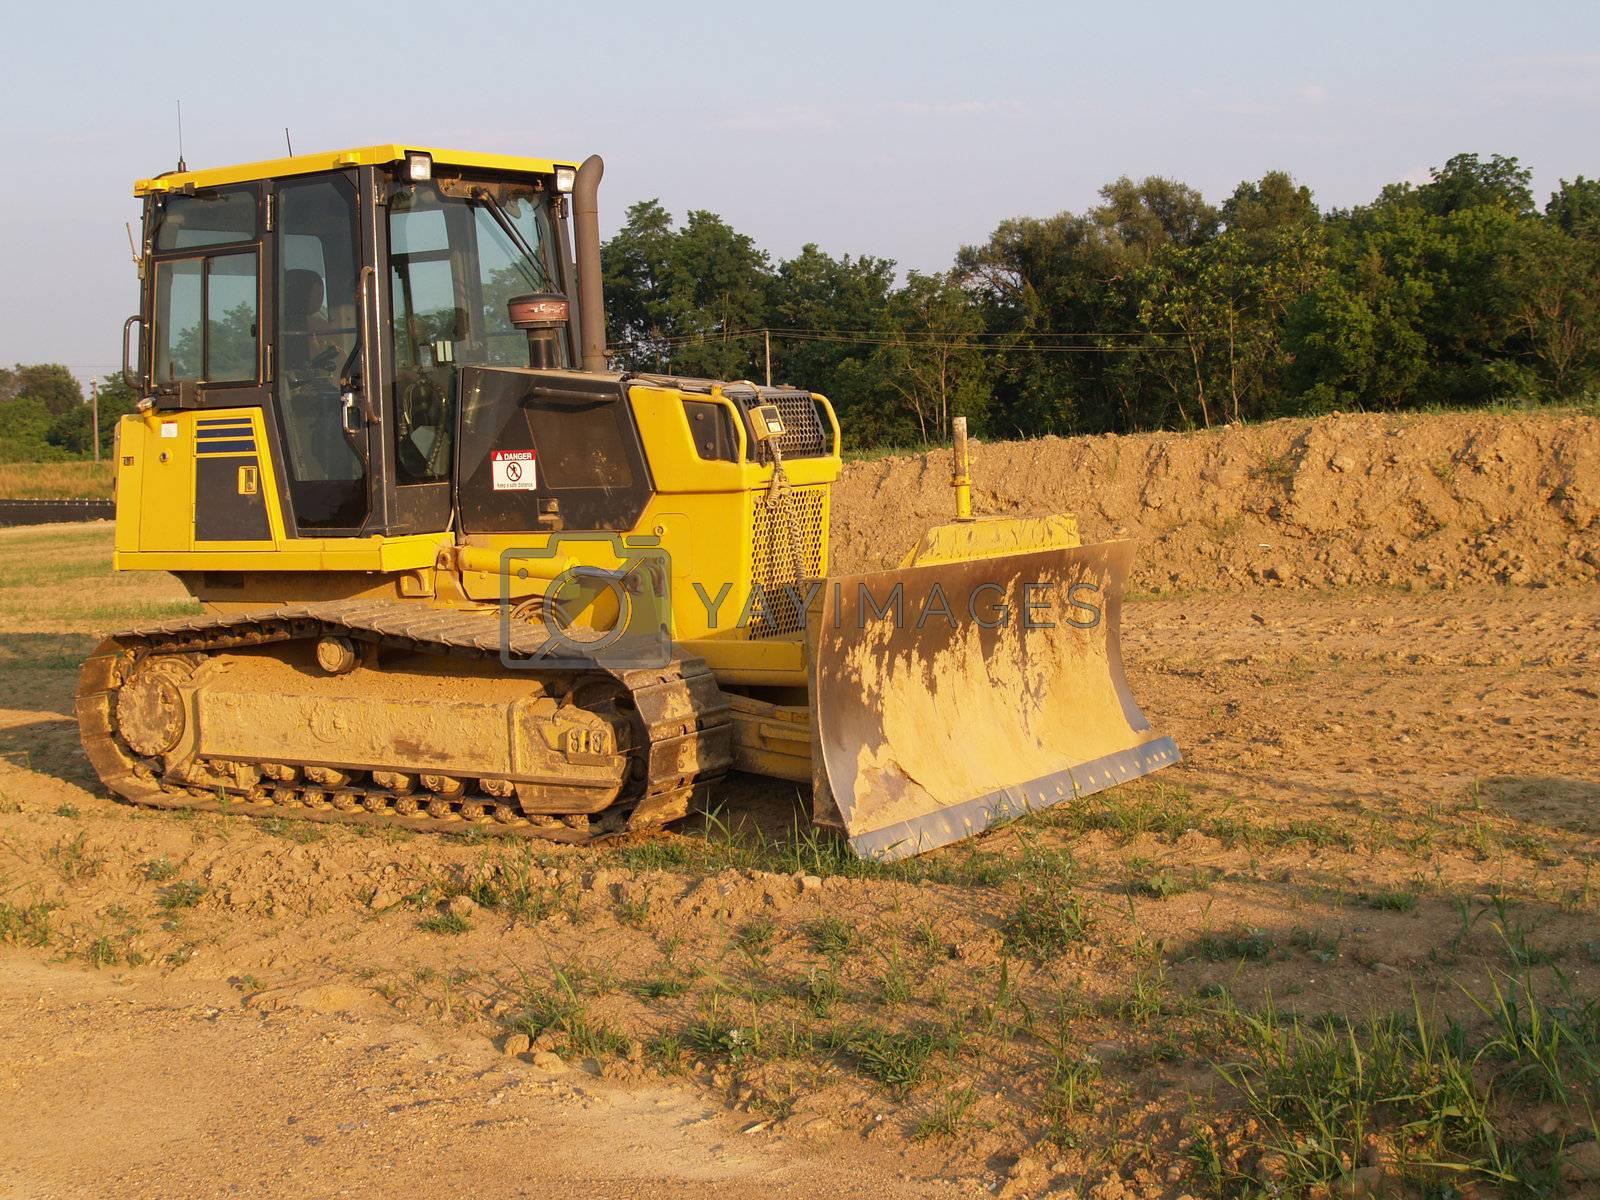 heavy duty bulldozer at a construction site